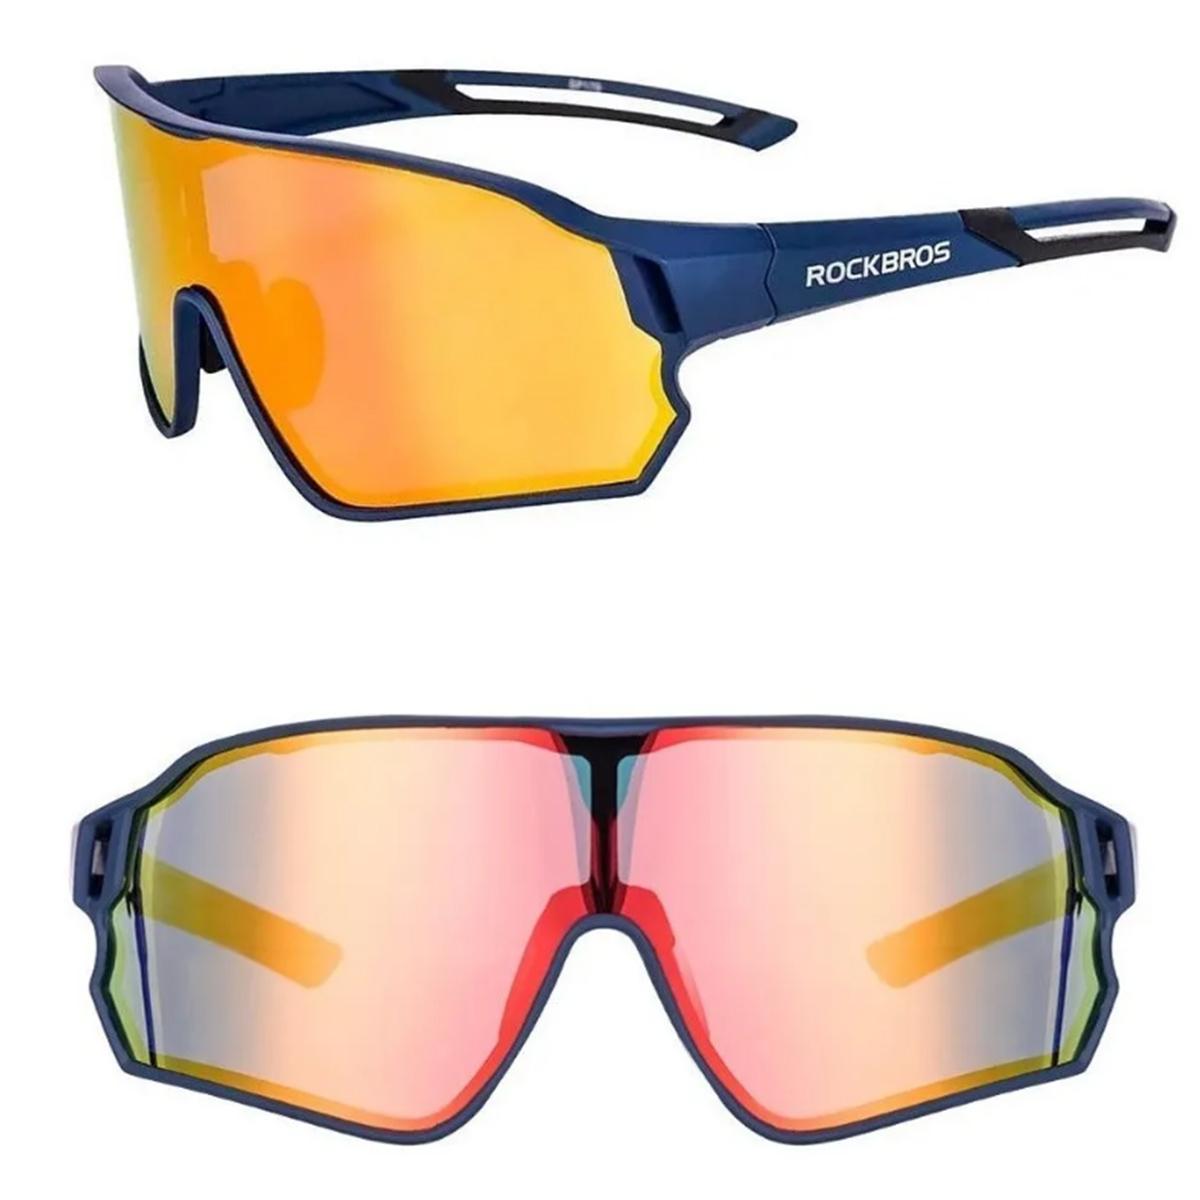 Óculos Bicicleta Ciclismo Bike - Lente Miopia - Polarizado - Rockbros